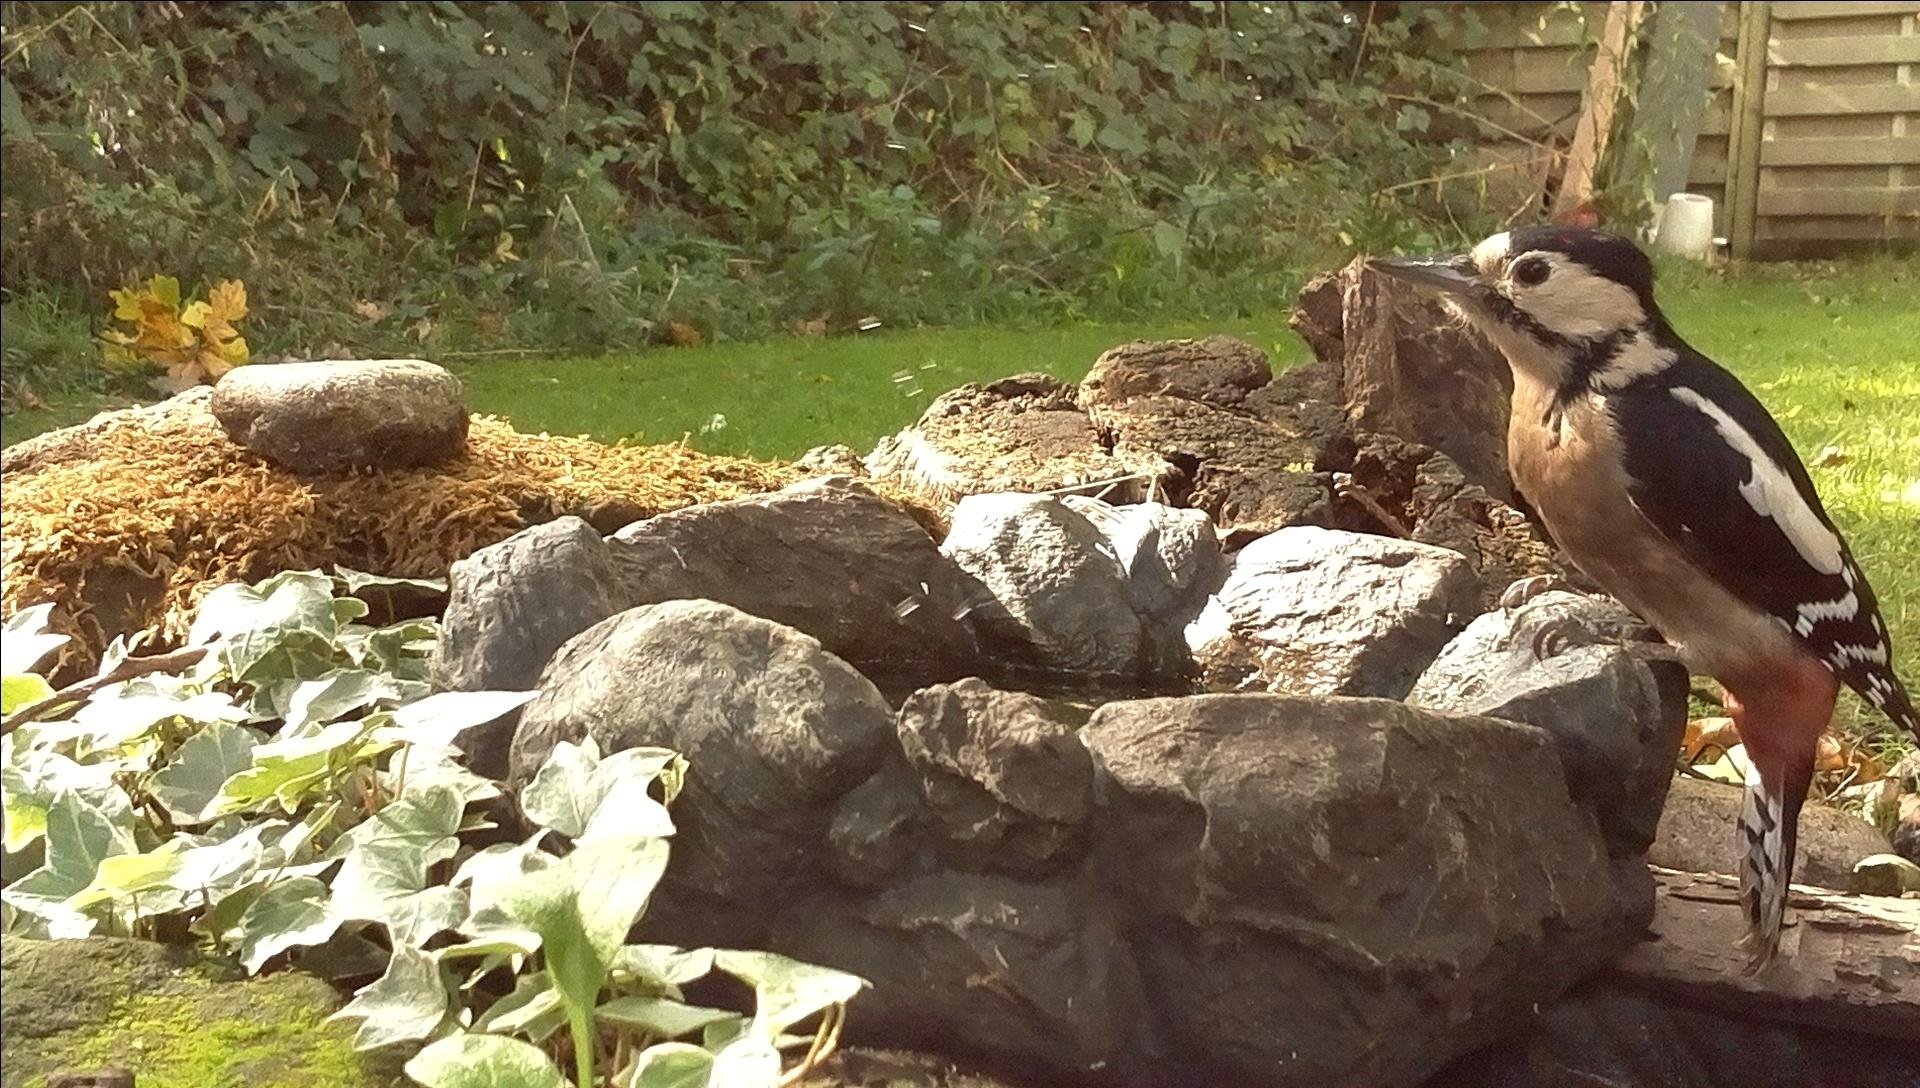 Setting up a 'My Naturewatch' Raspberry Pi Camera   www wildlifekate